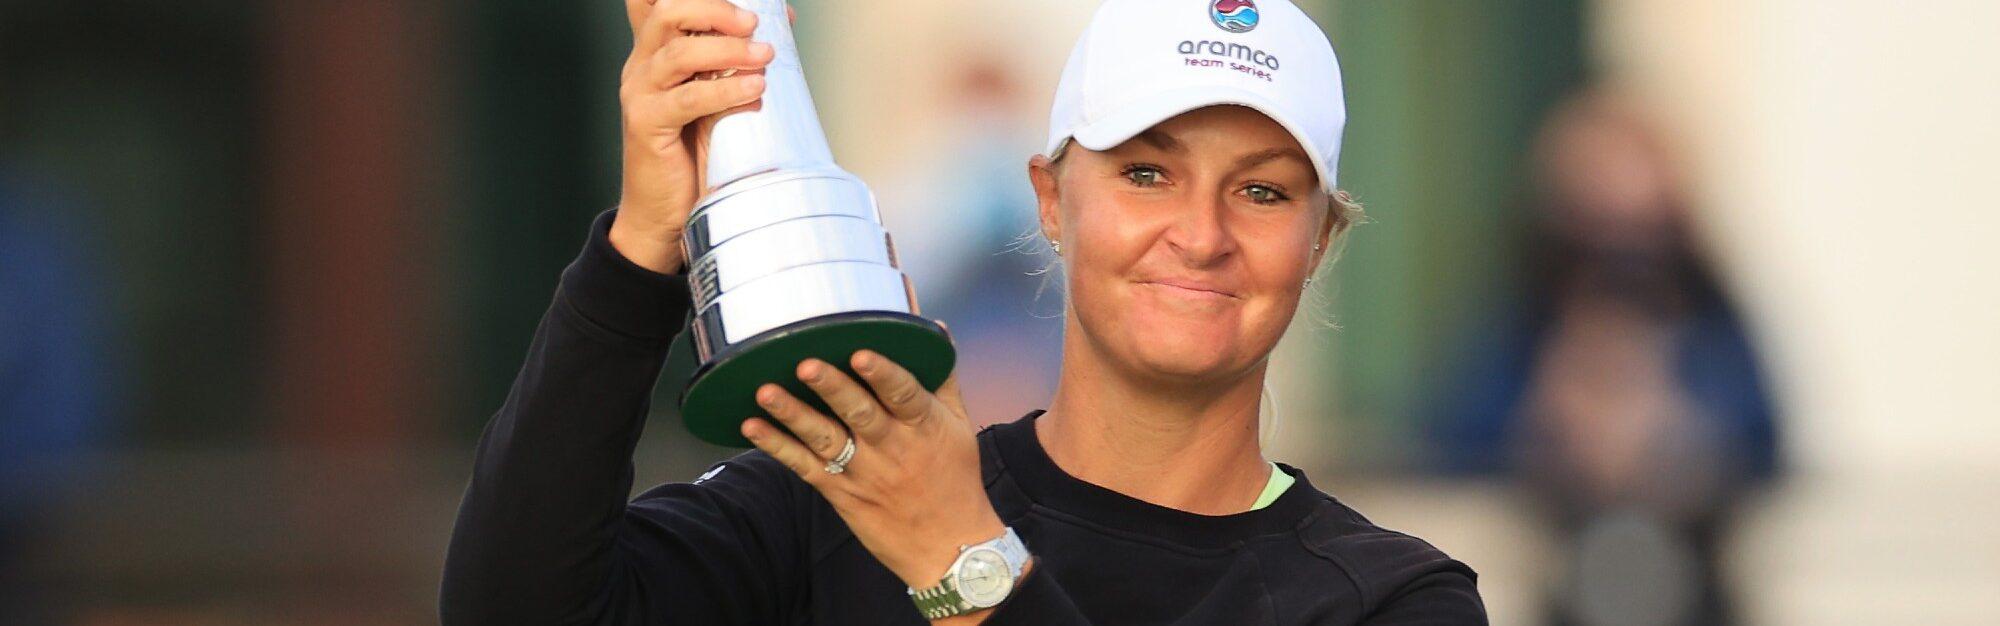 The Slam: Nordqvist hangs on in brutal Women's Open finish, and Finau's done it!